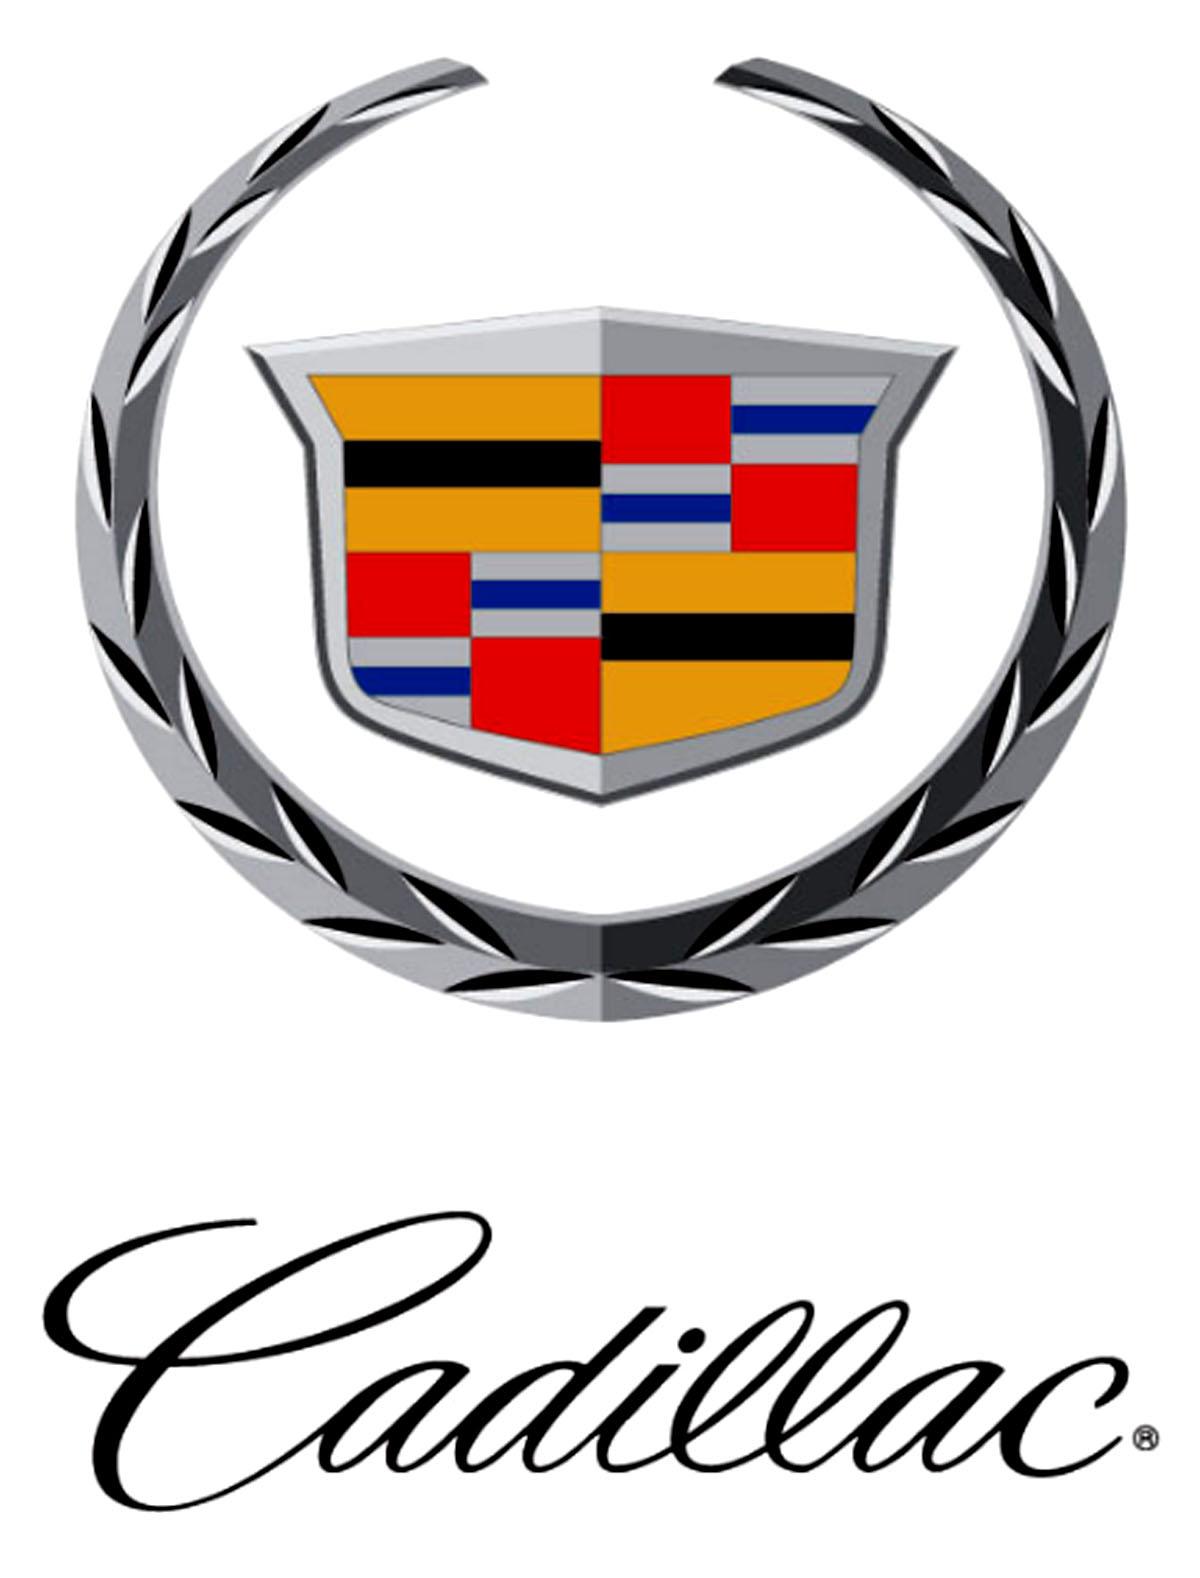 Logo Bcadillac on Automobile Asbaquez